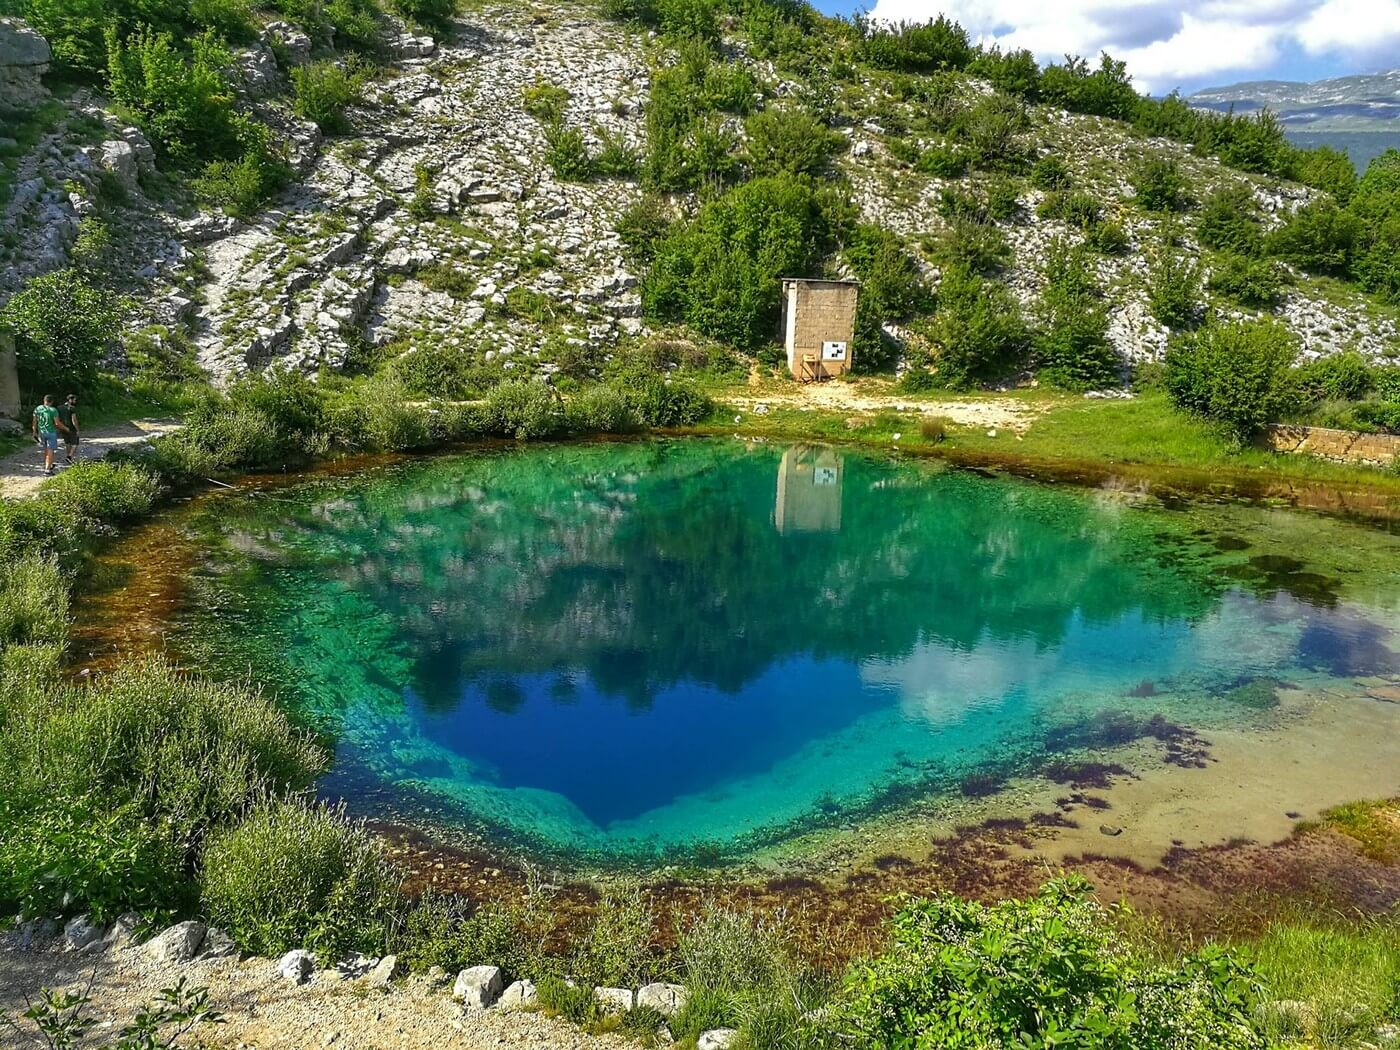 vrelo cetine source de la rivière cetina en dalmatie, site insolite en croatie